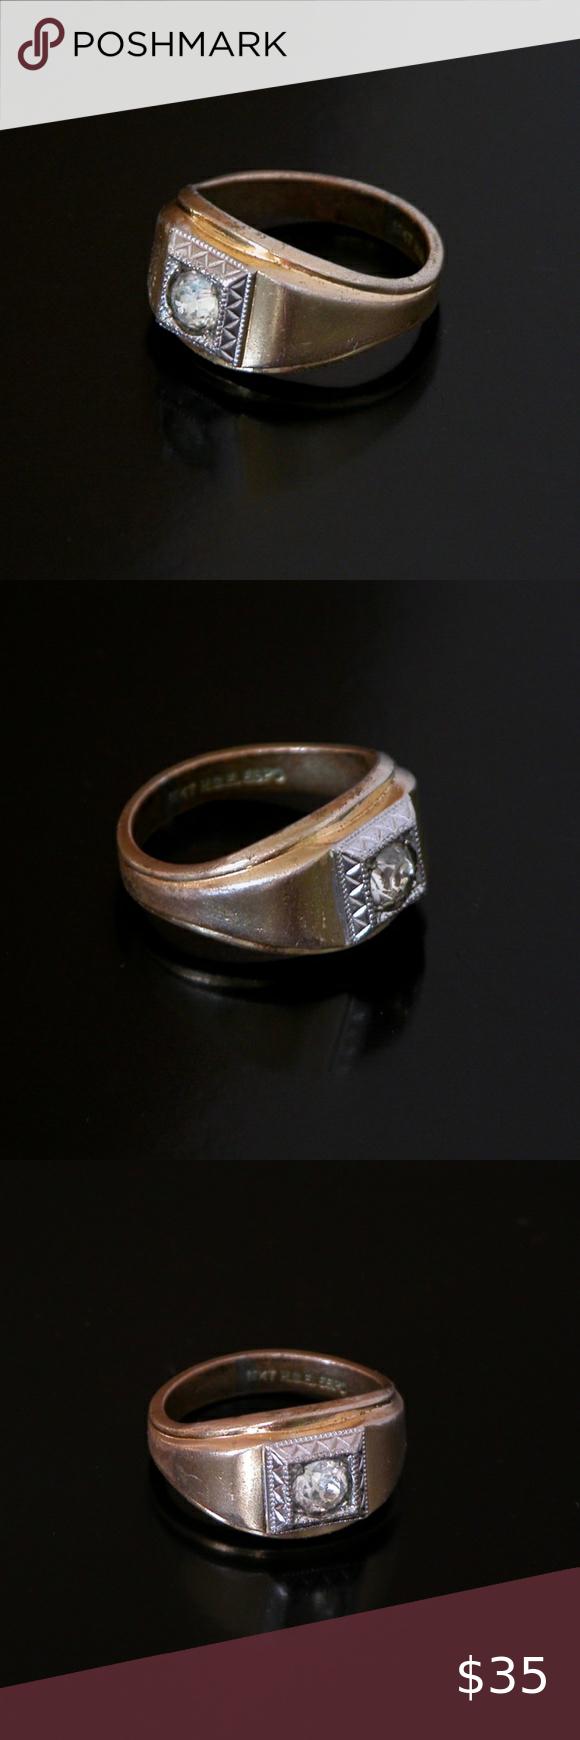 Vtg 18k H G E Espo Grandpa S Gold Ring Cubic Zirc Mens Accessories Jewelry Gold Rings Rings For Men